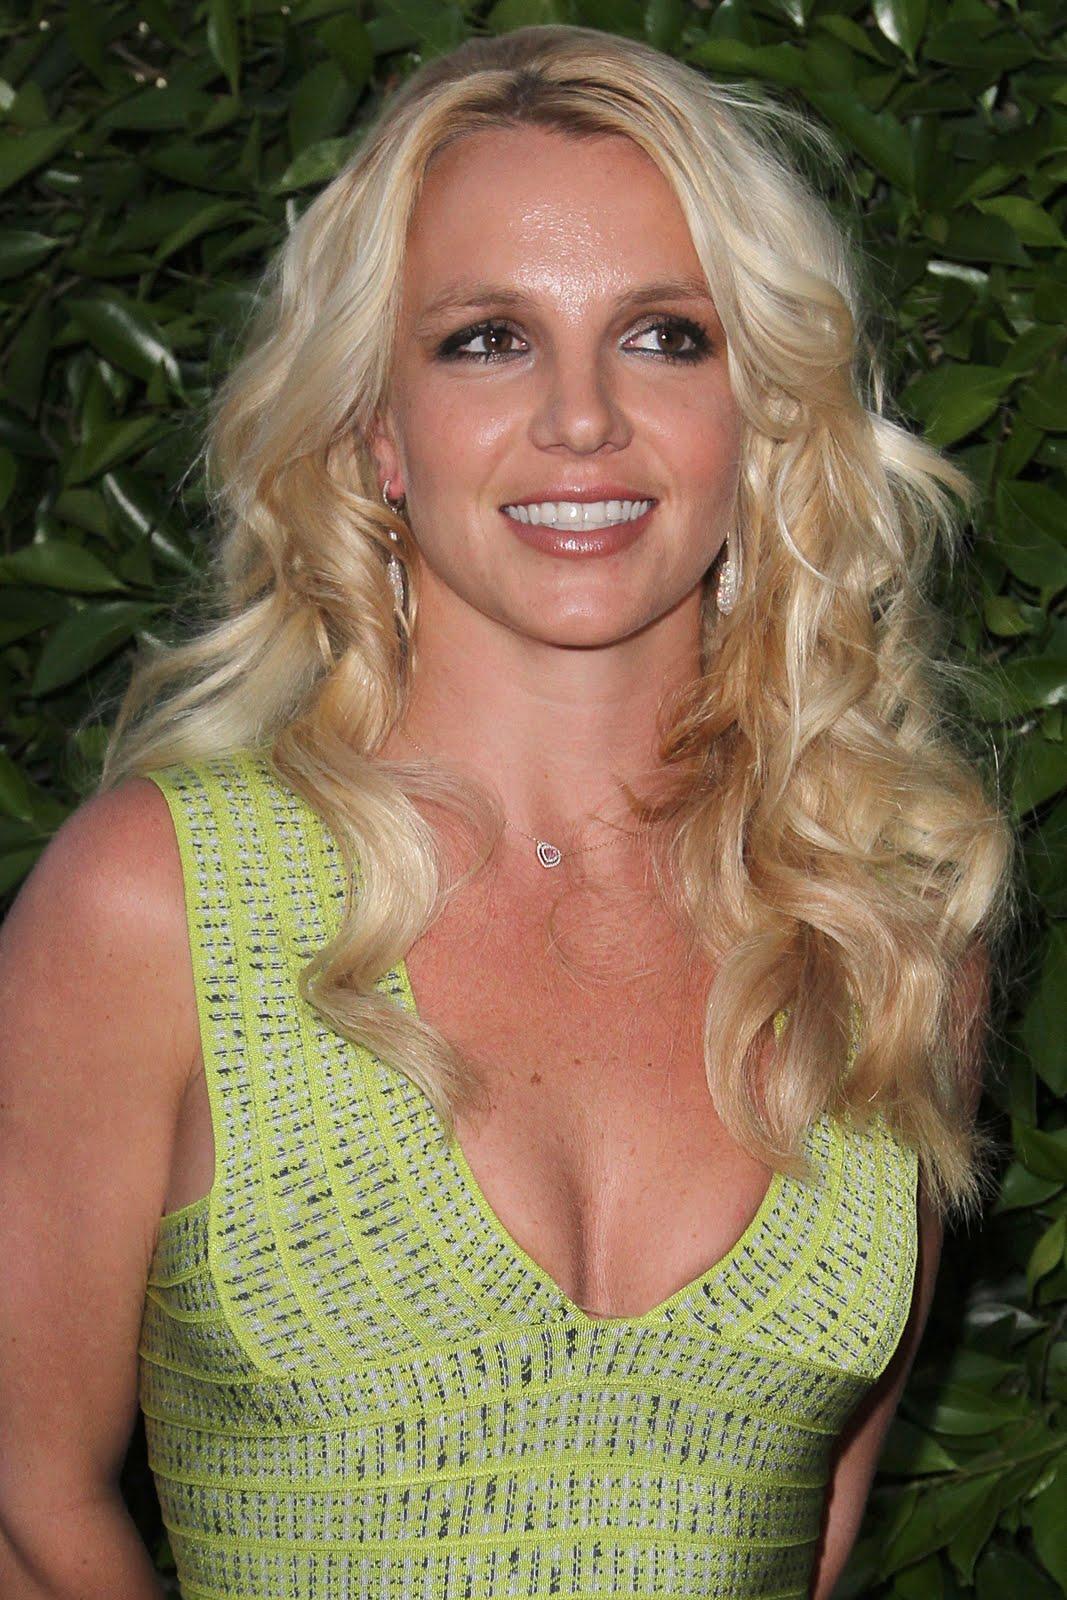 http://4.bp.blogspot.com/-qiwl41WVUoU/ThZukiZFUDI/AAAAAAAAFVQ/7S6CAmLgJhk/s1600/Britney+Spears-femme+fatale-circus-ooops+i+did+it+gain-pics-Britney+Spears+2011-+%25284%2529.jpg